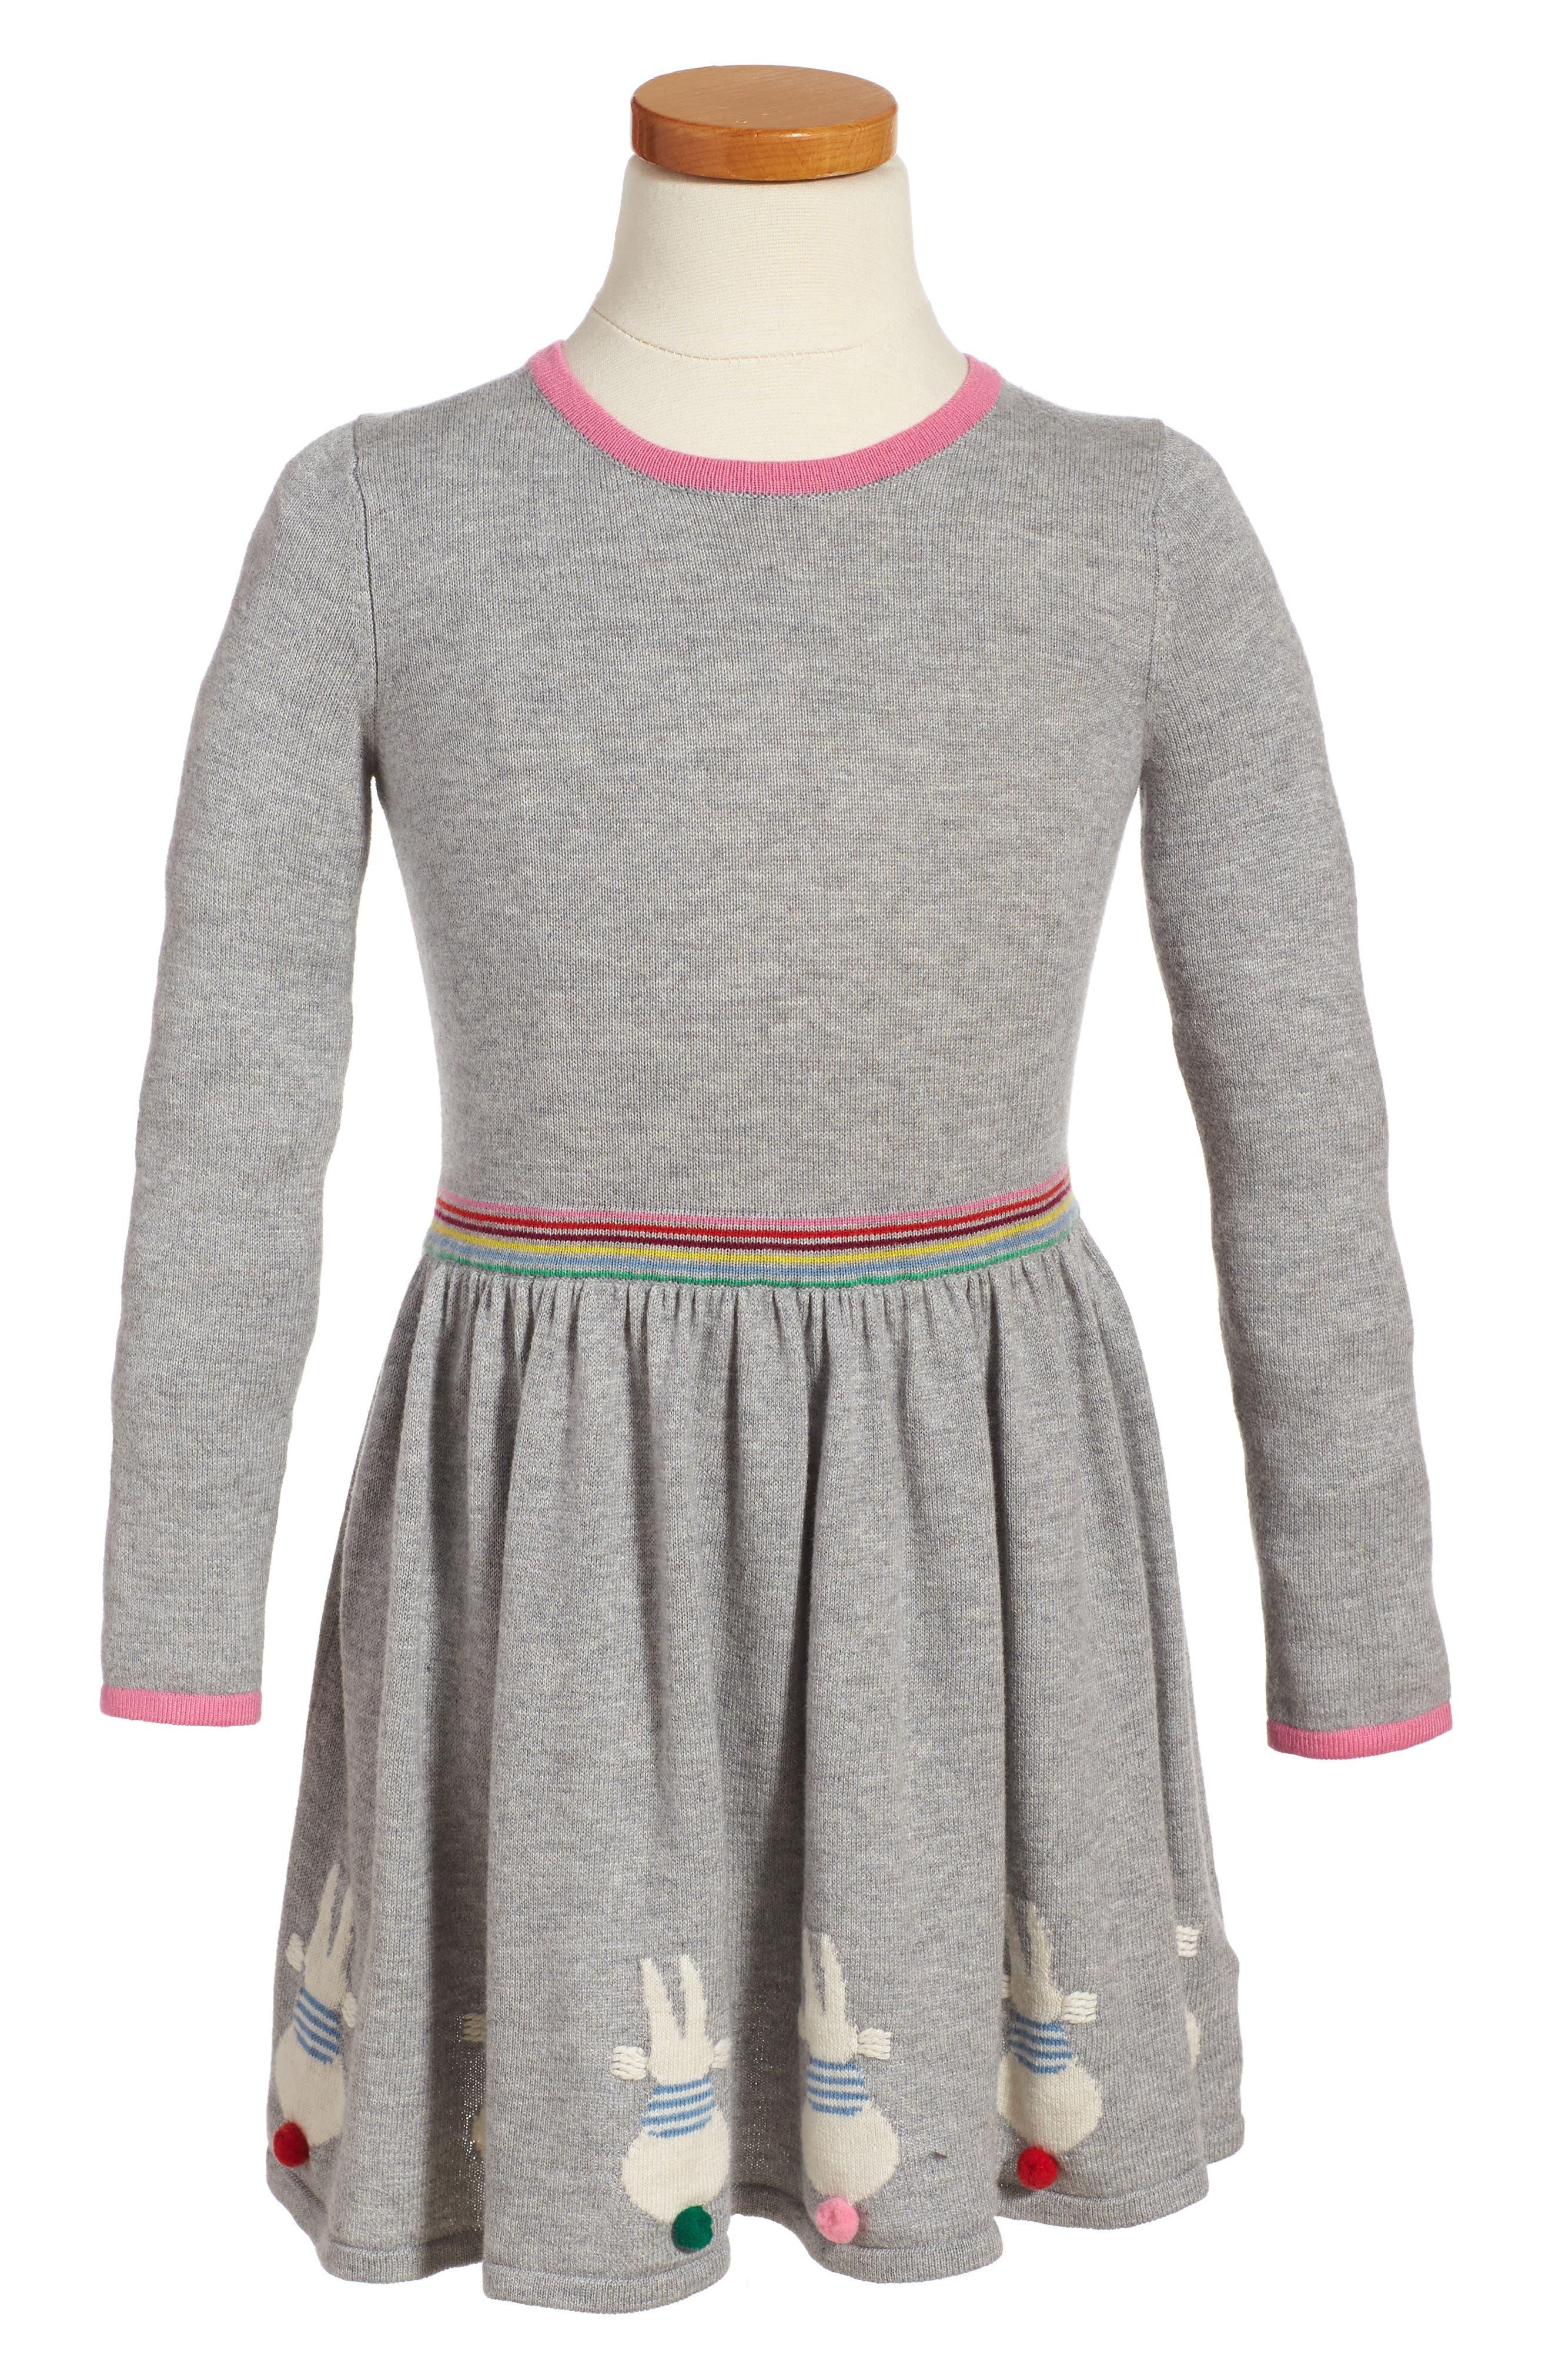 MINI BODEN Bunny Sweater Dress